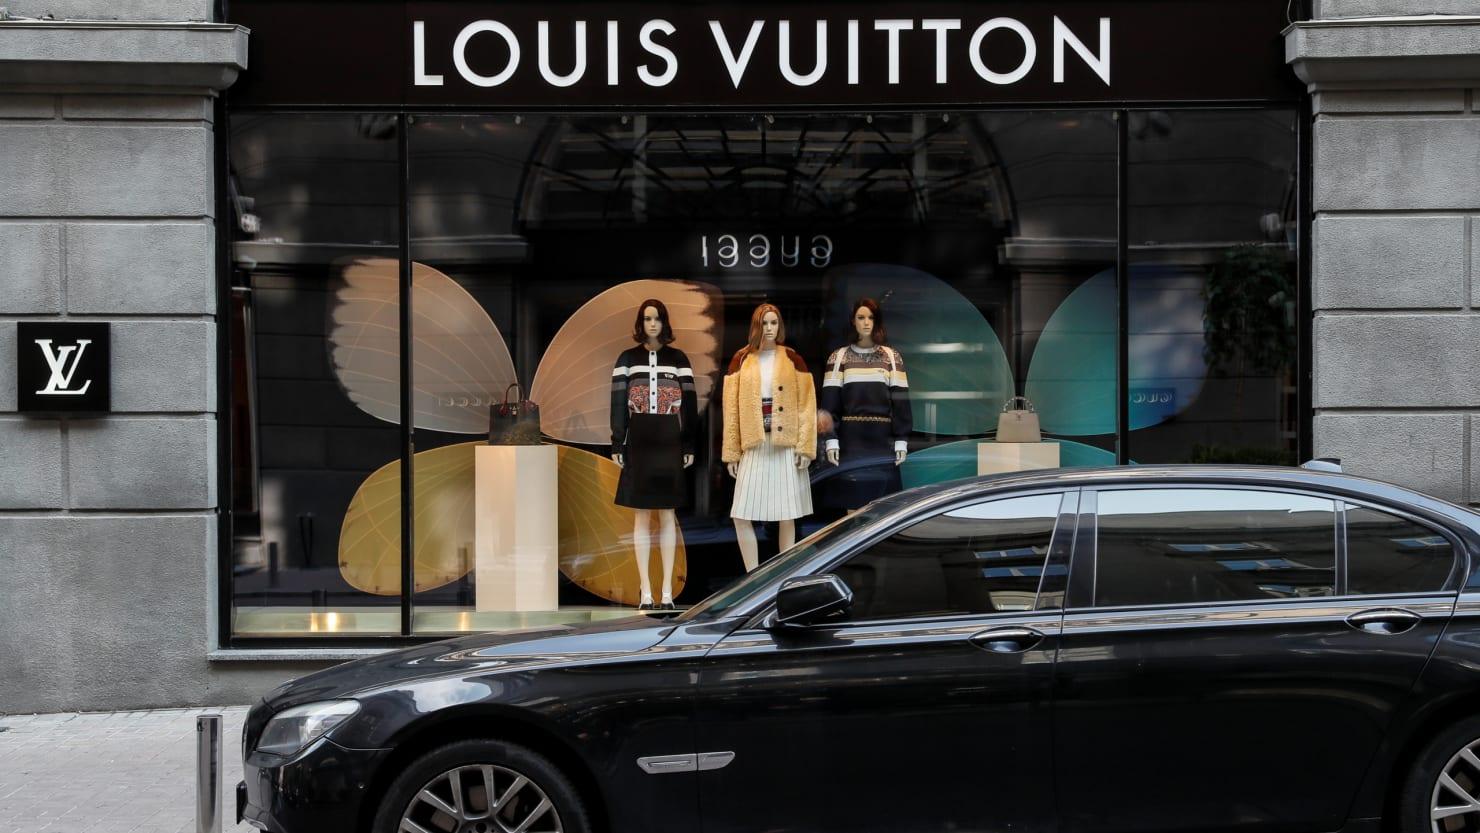 2019 year look- Vuitton louis sues warner bros